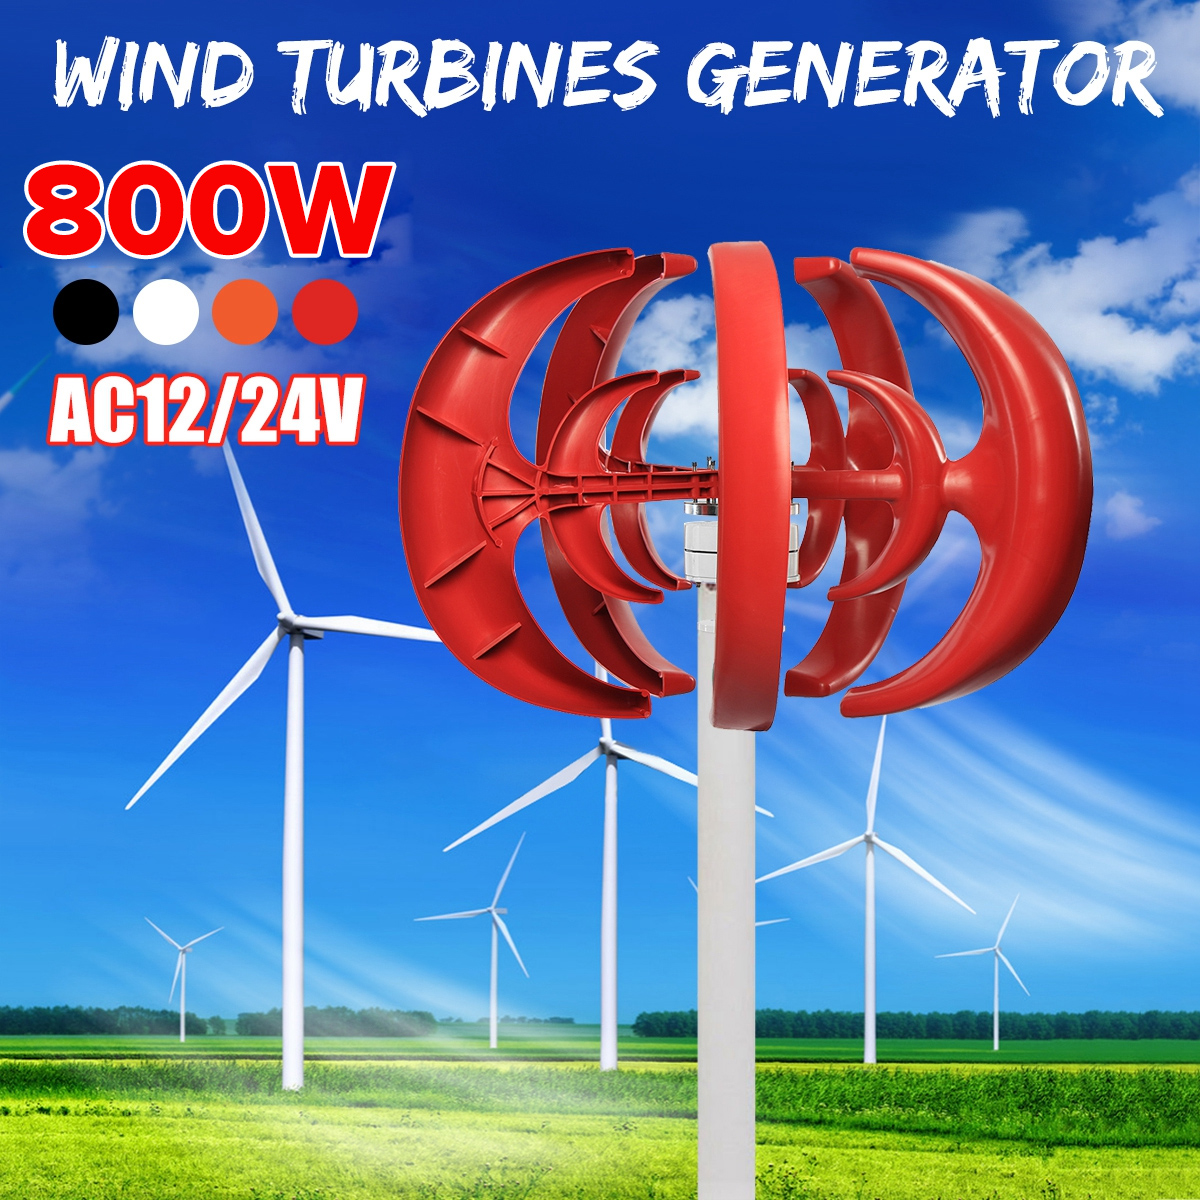 Max 800W AC 12/24V Wind Turbines Generator Lantern 5 Blades Motor Kit Vertical Axis For Home Hybrid Streetlight Use